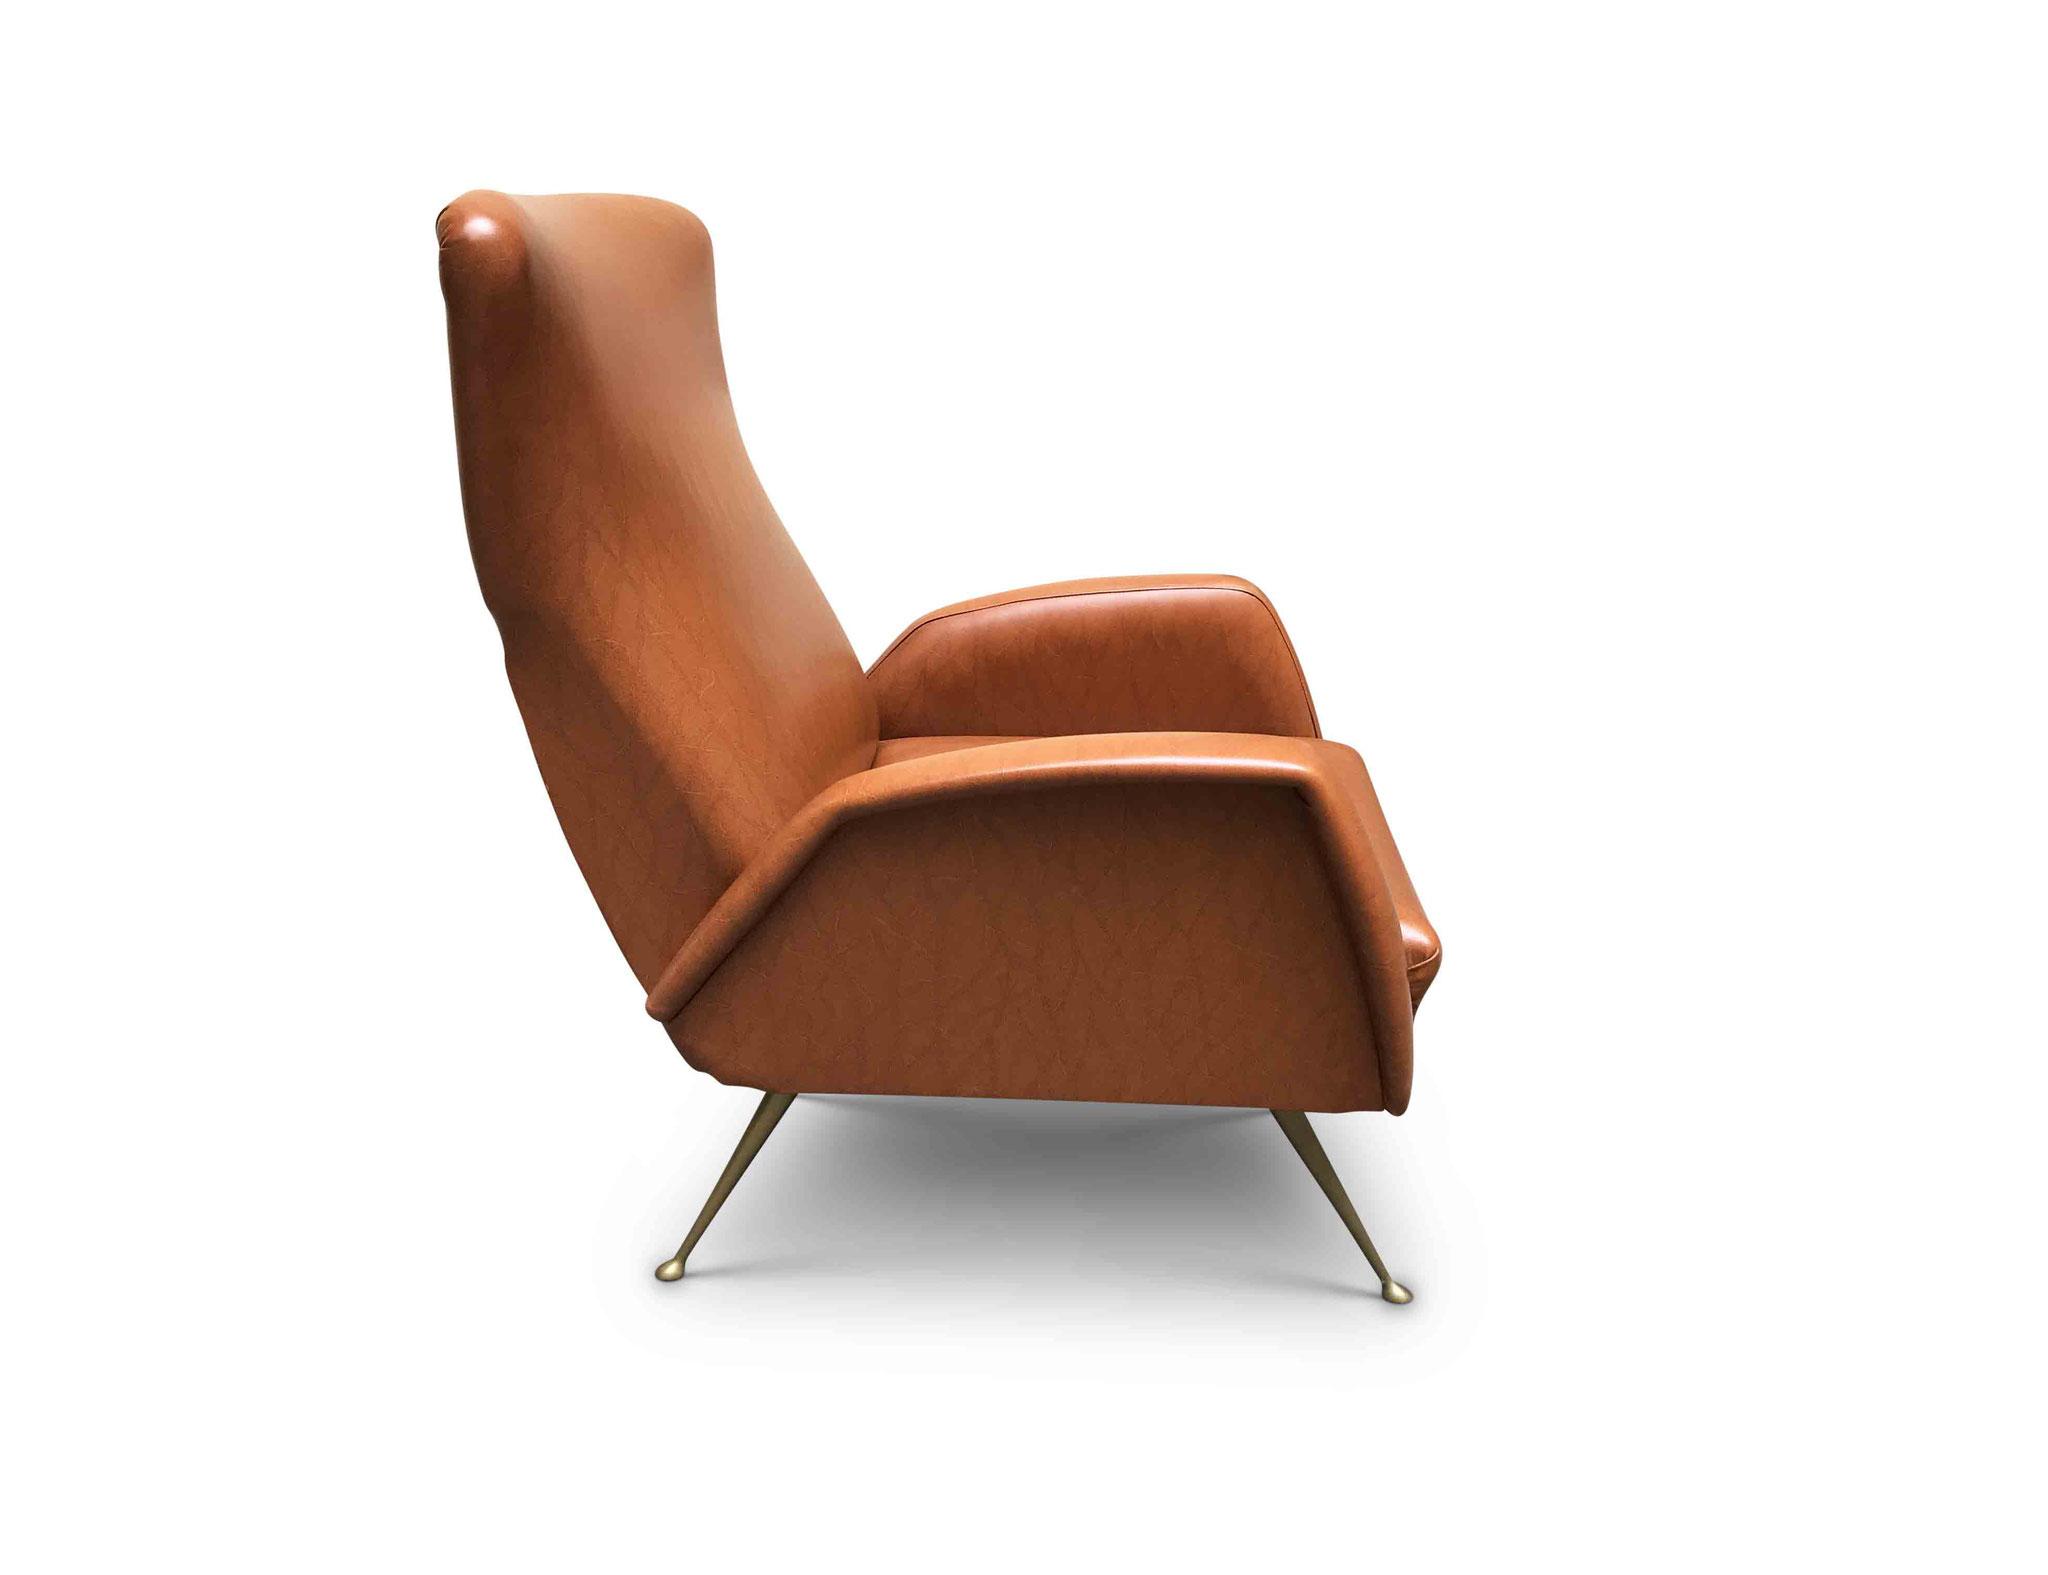 poltrona vintage chair